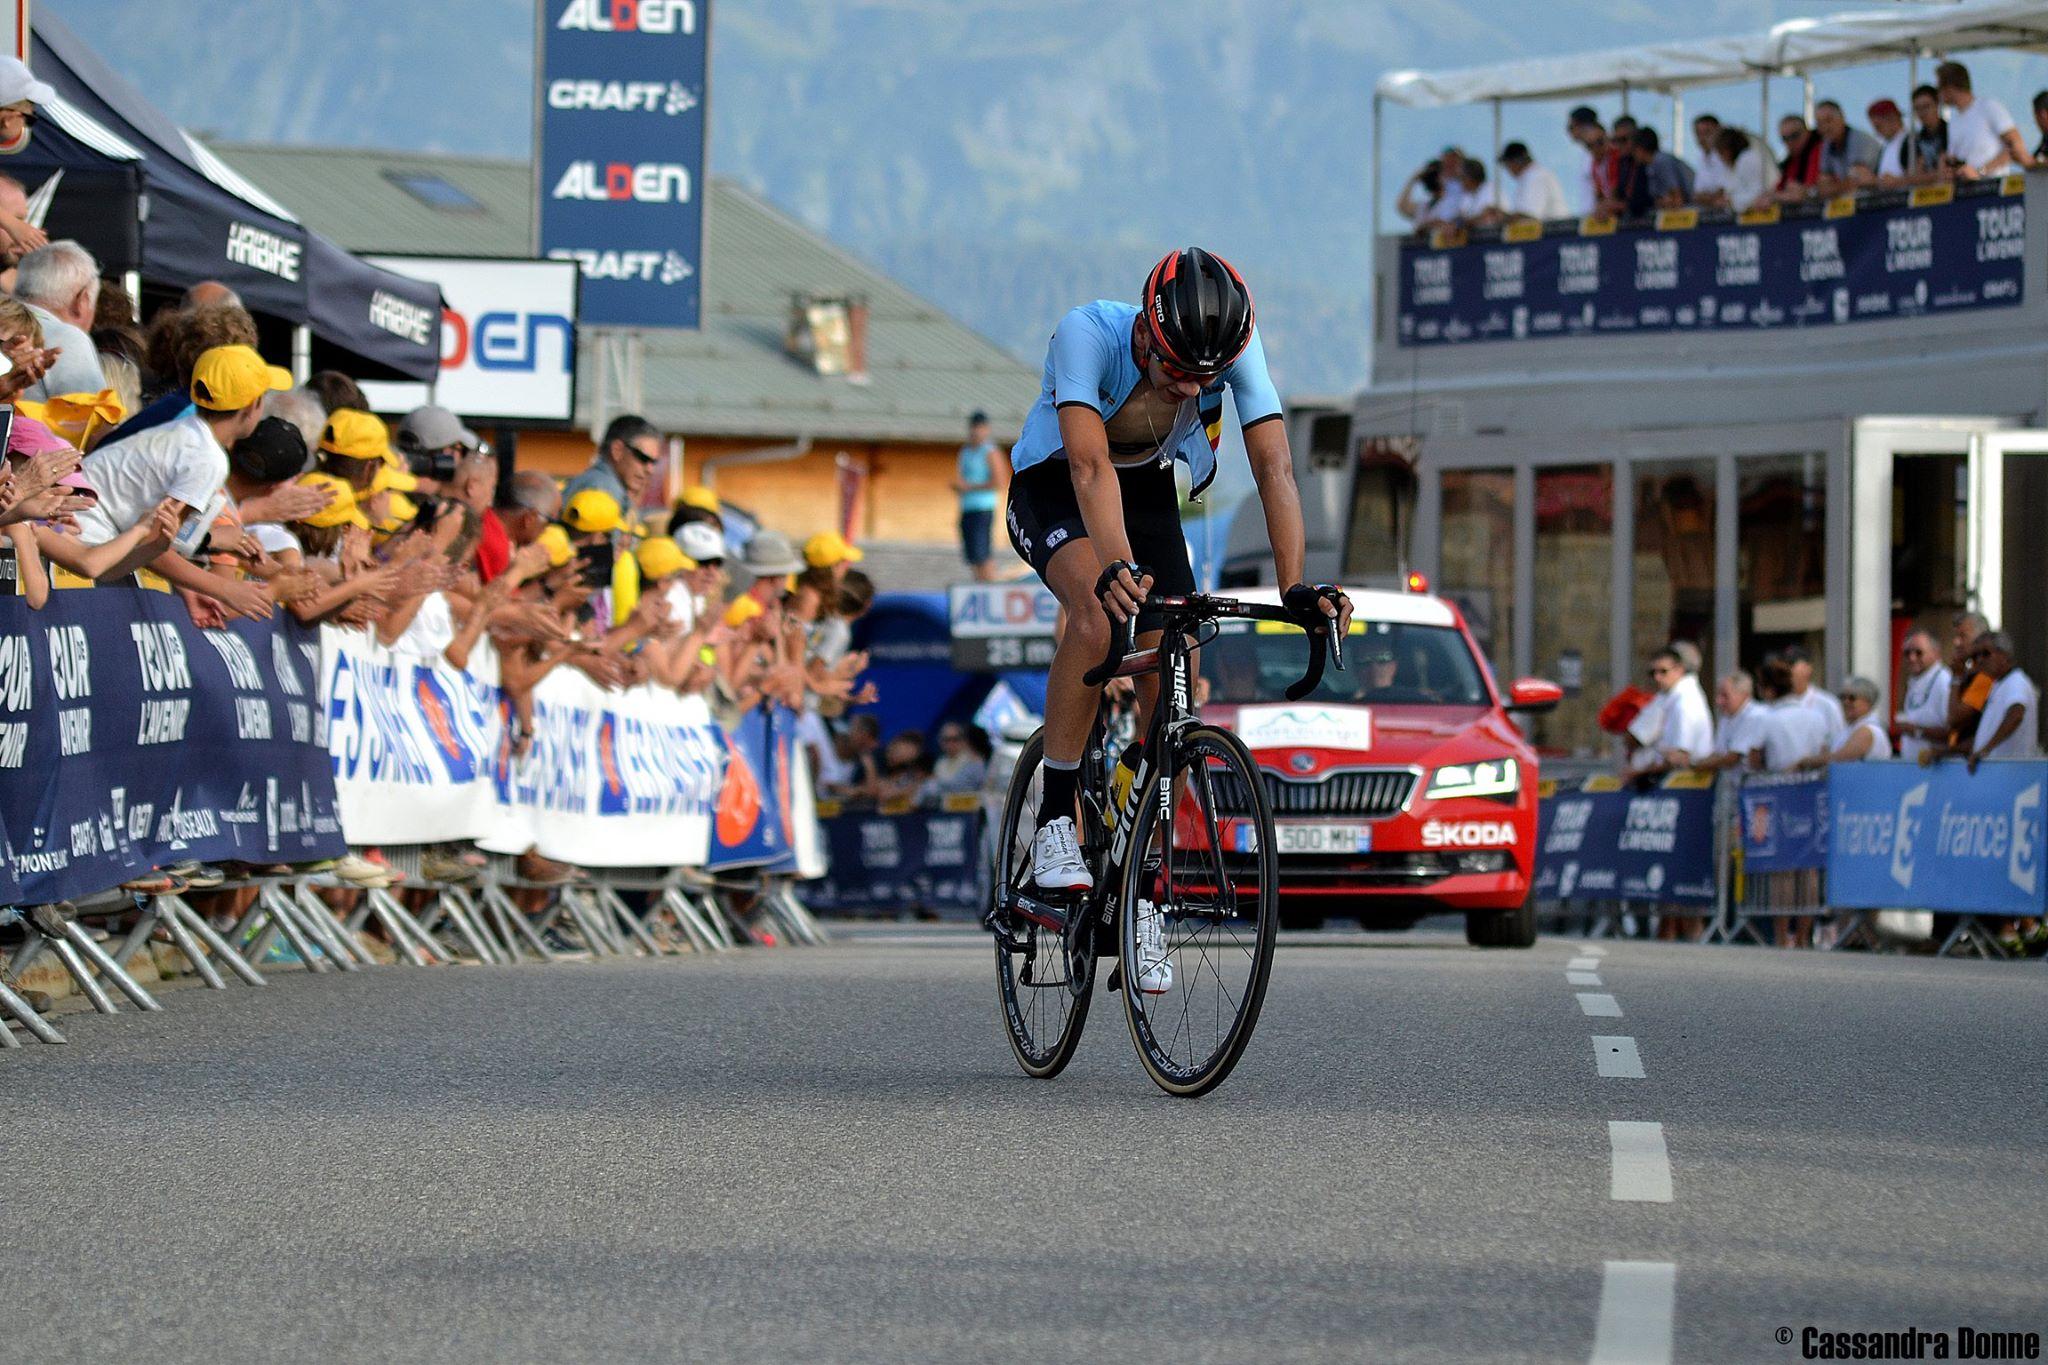 Steff Cras at the Tour de l'Avenir 2017